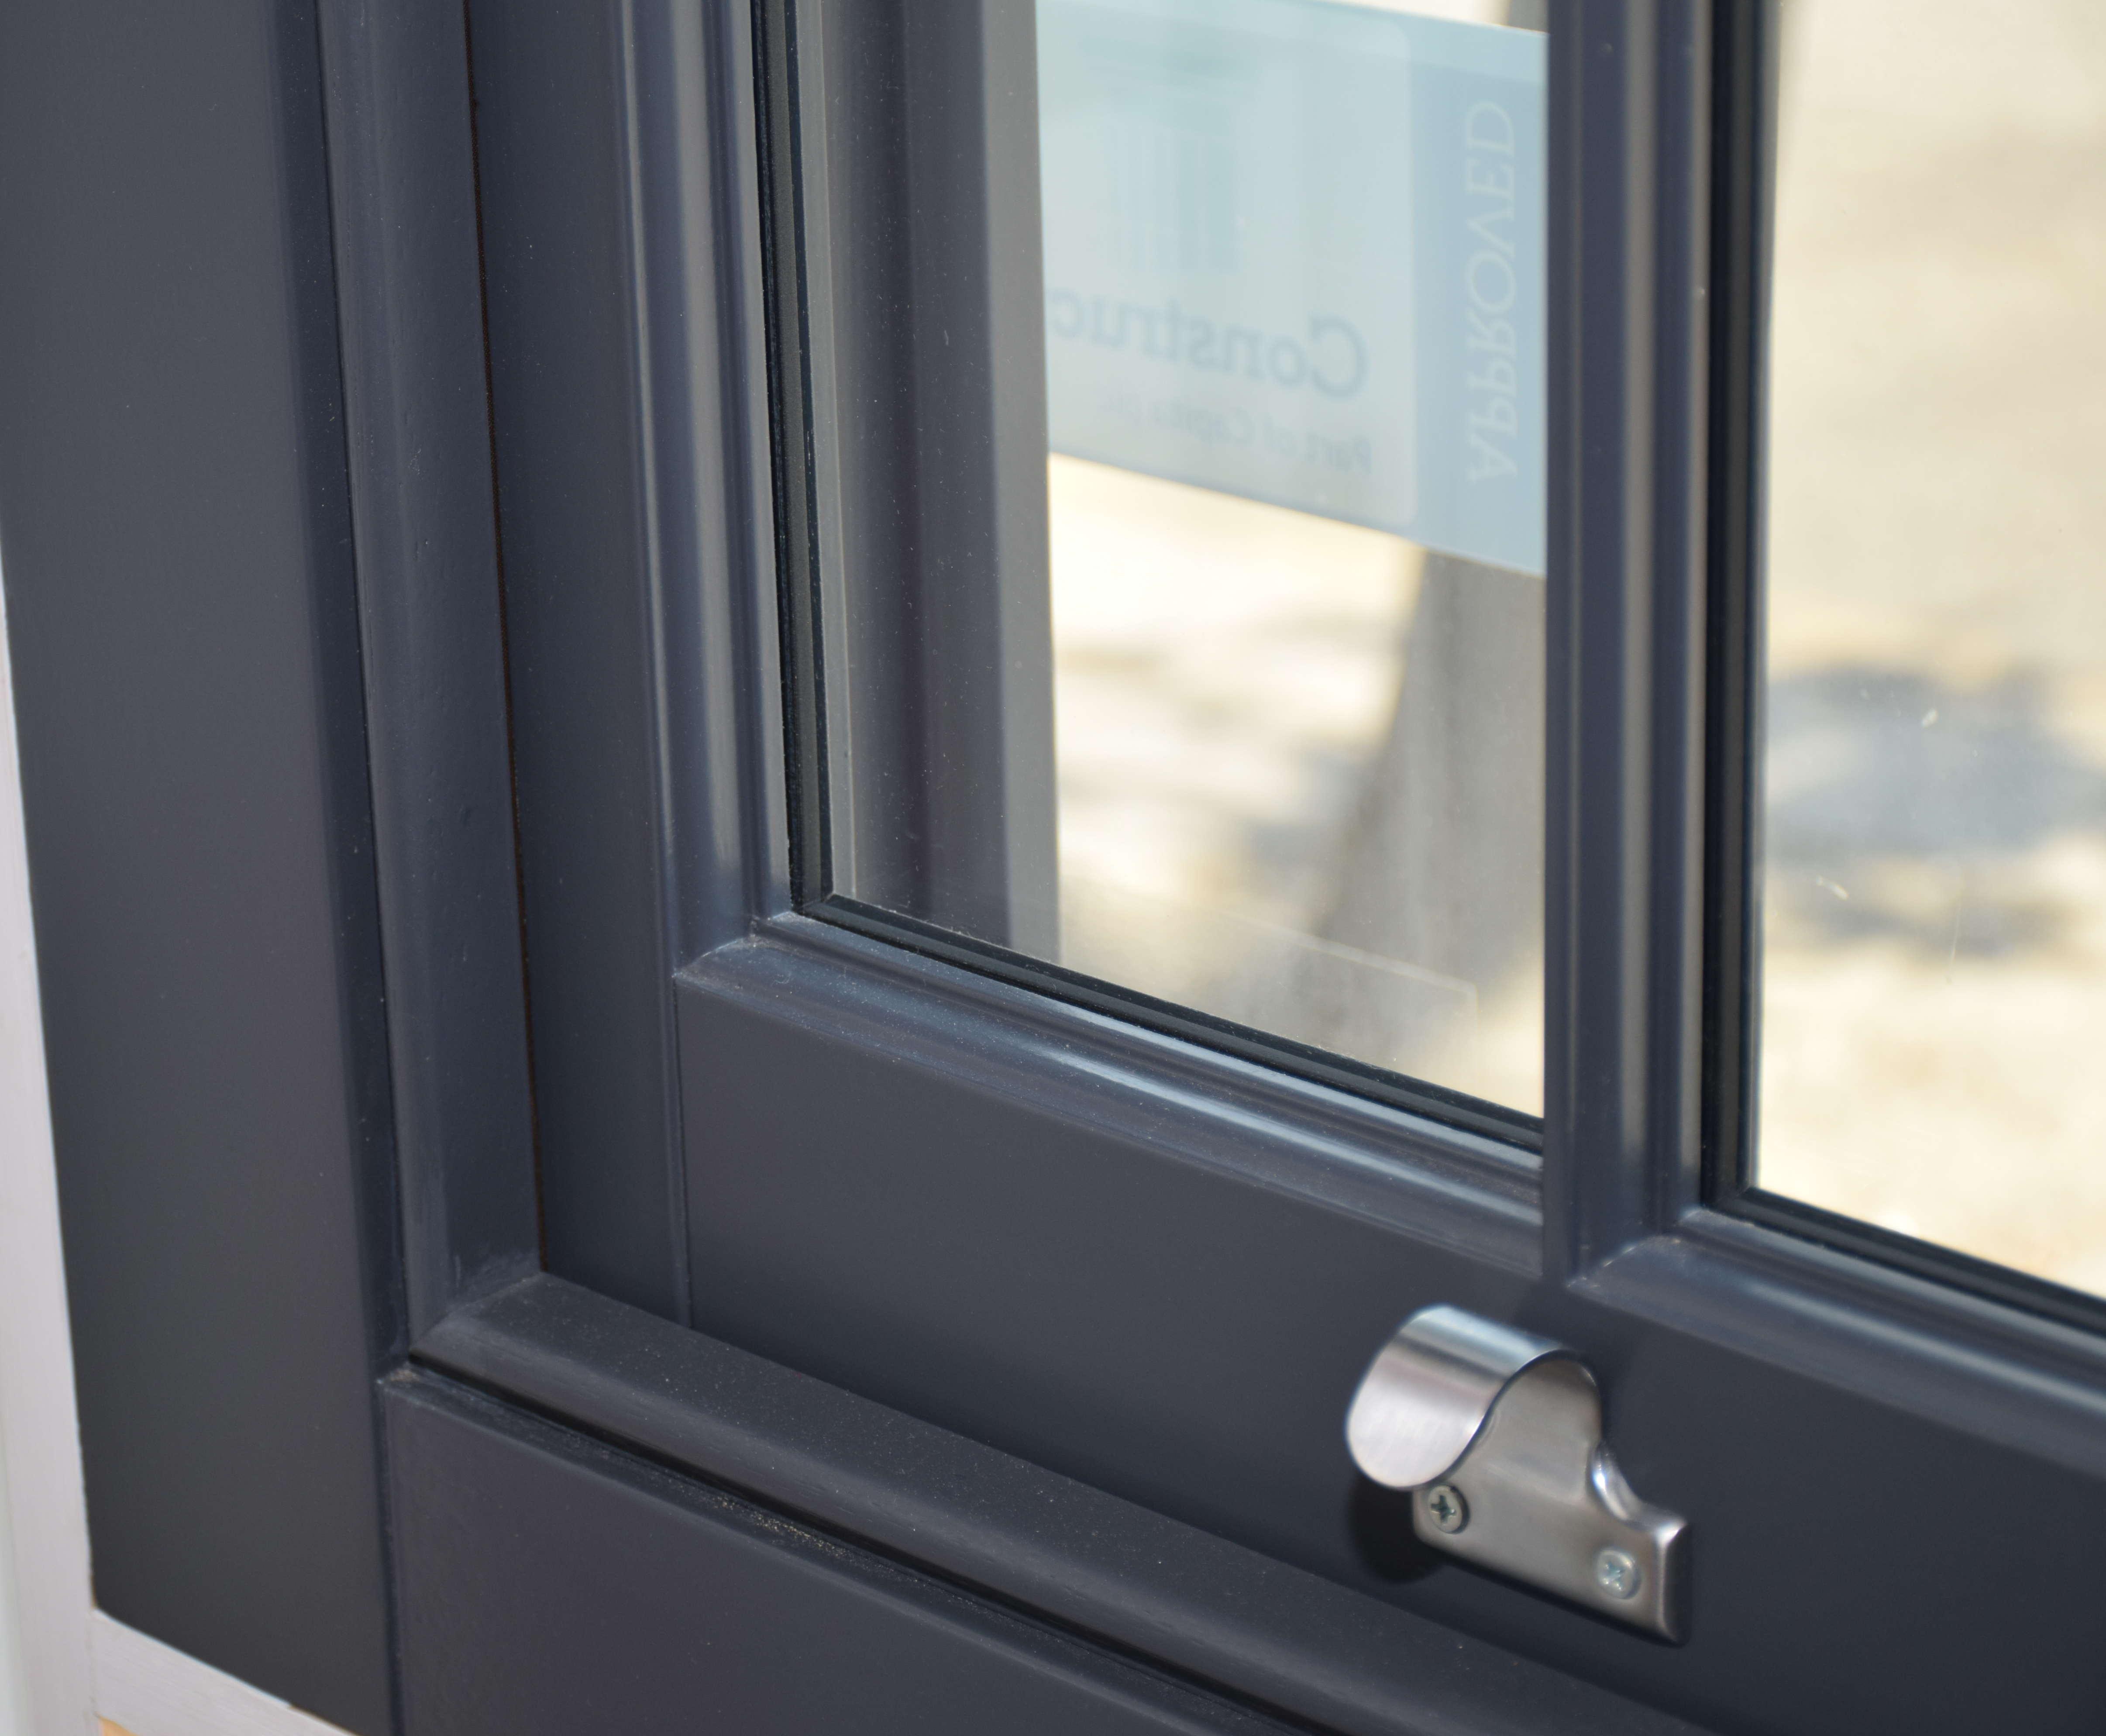 bespoke_windows_london_ltd_.traditional_sash_windows_with_slimline_glassJPGforwebsite